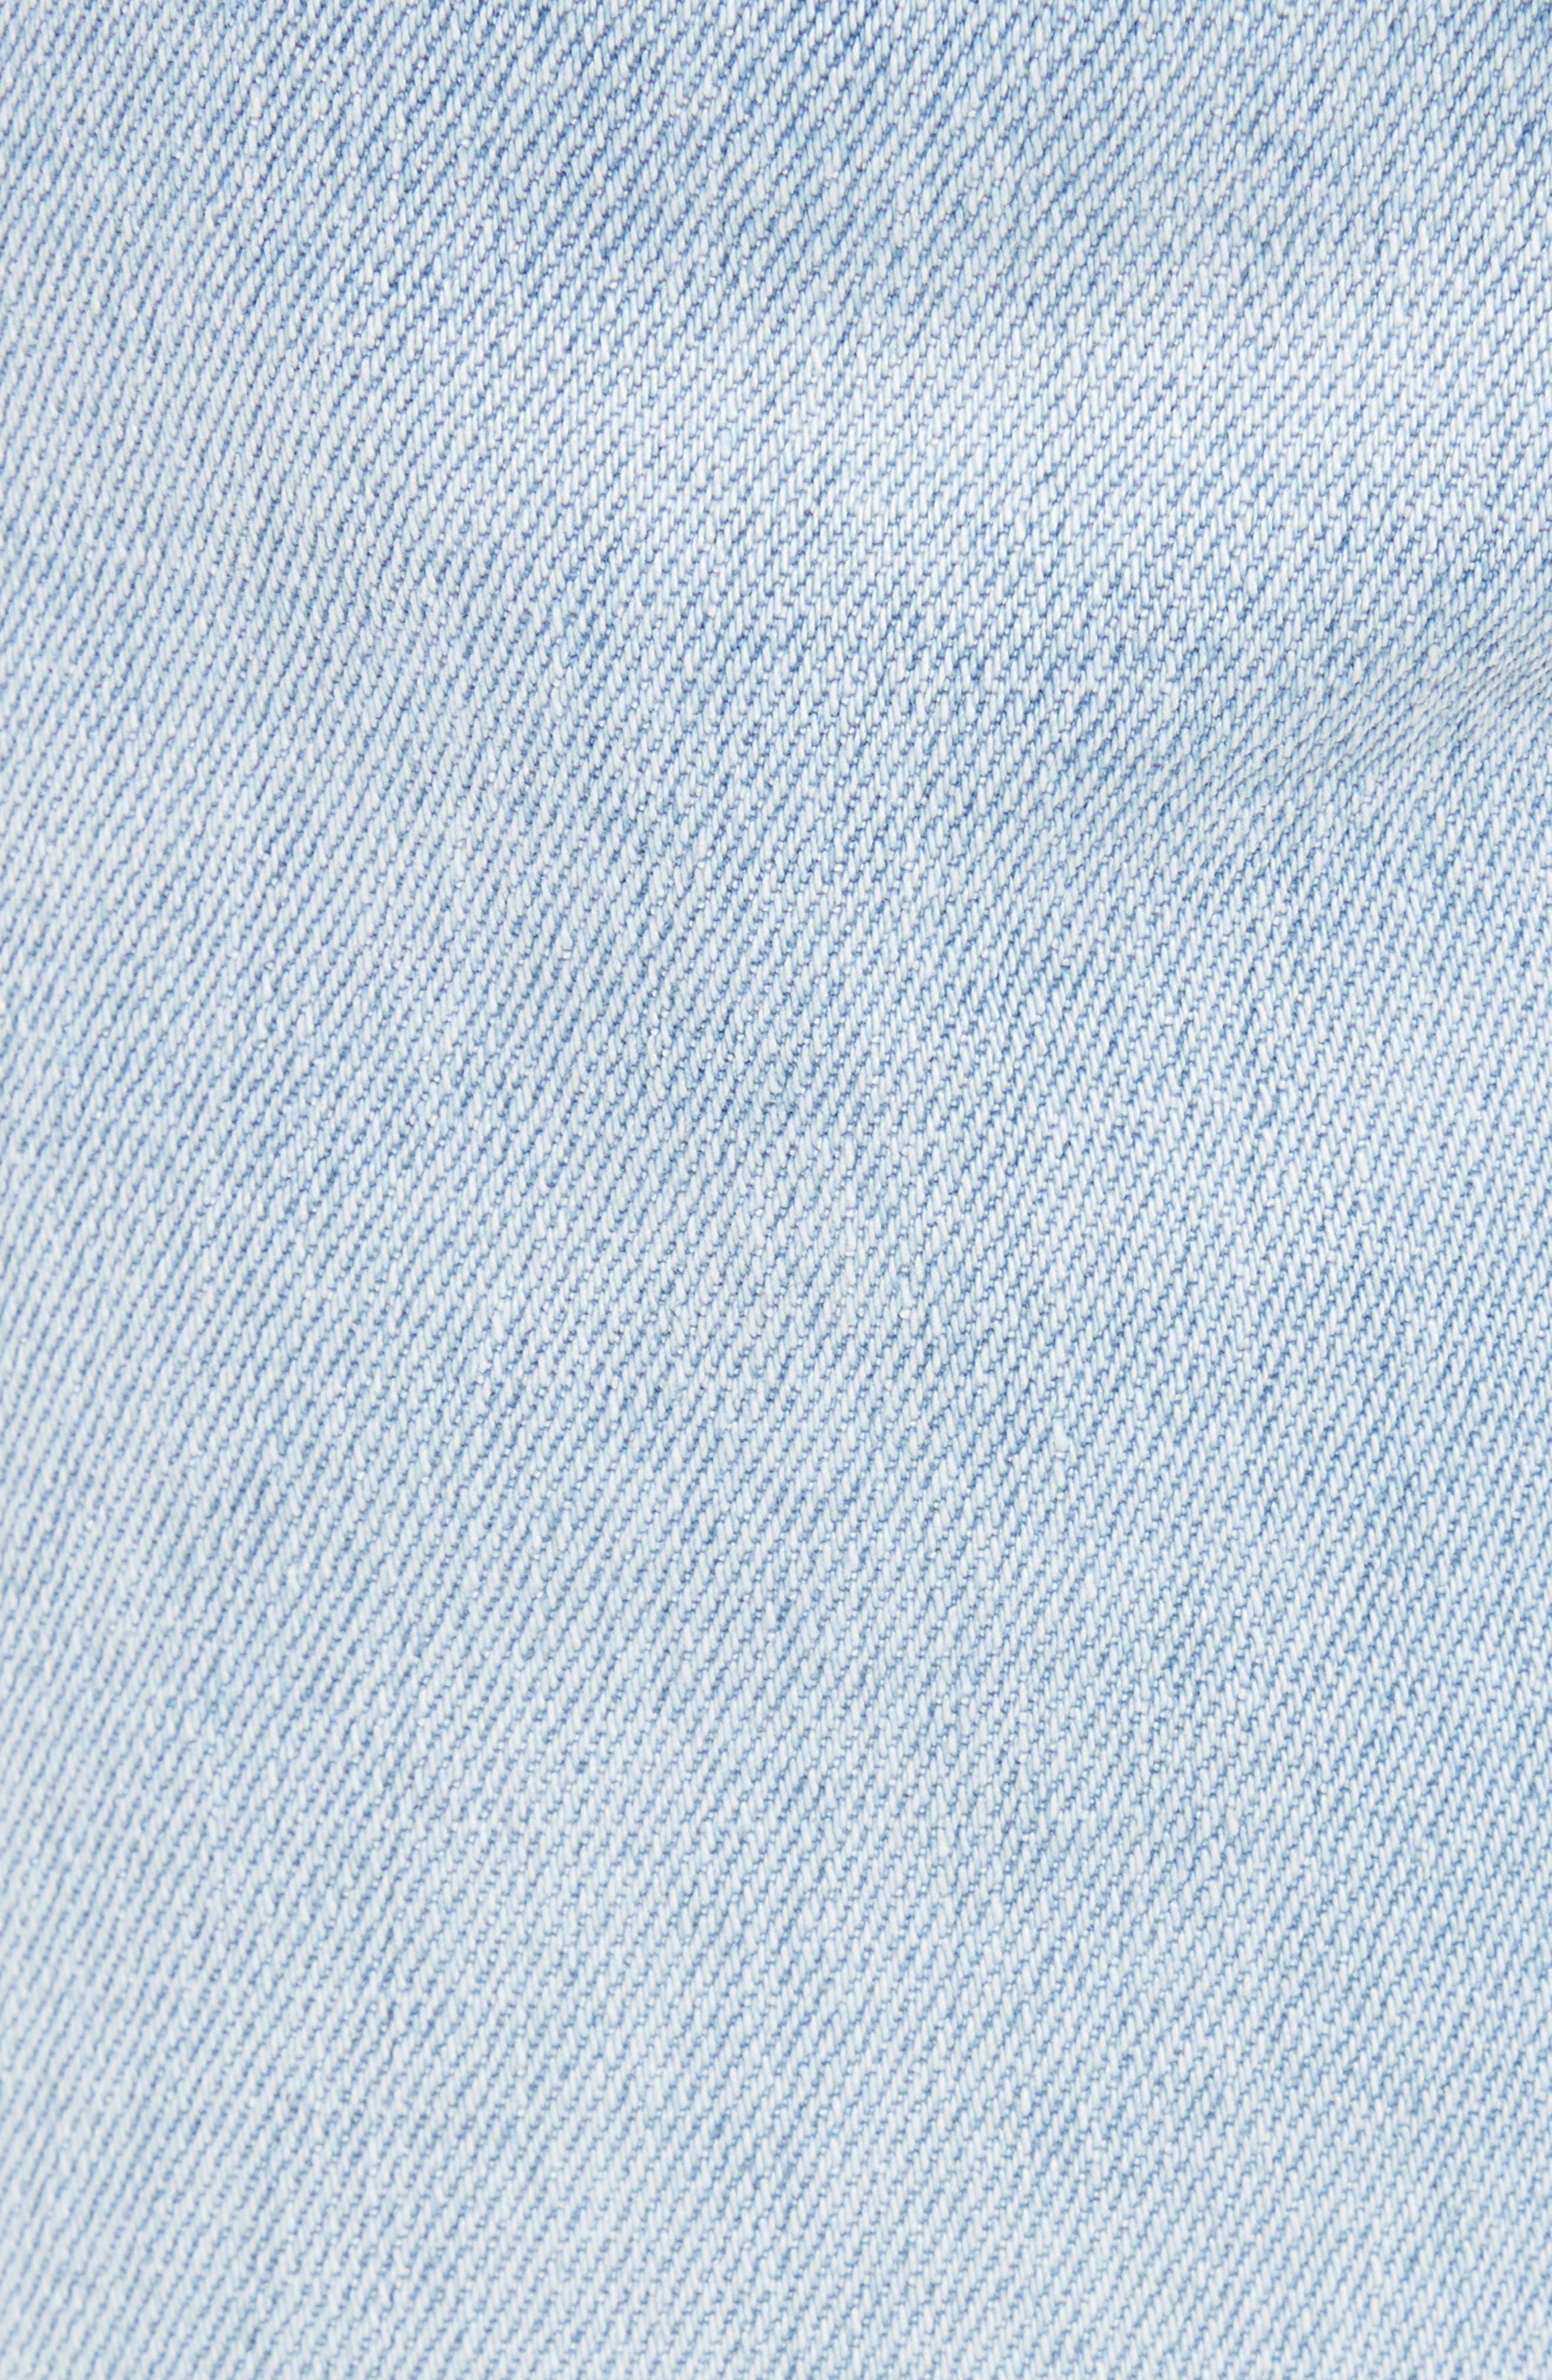 Ripped Skinny Jeans,                             Alternate thumbnail 5, color,                             BLUE CORGAN WASH